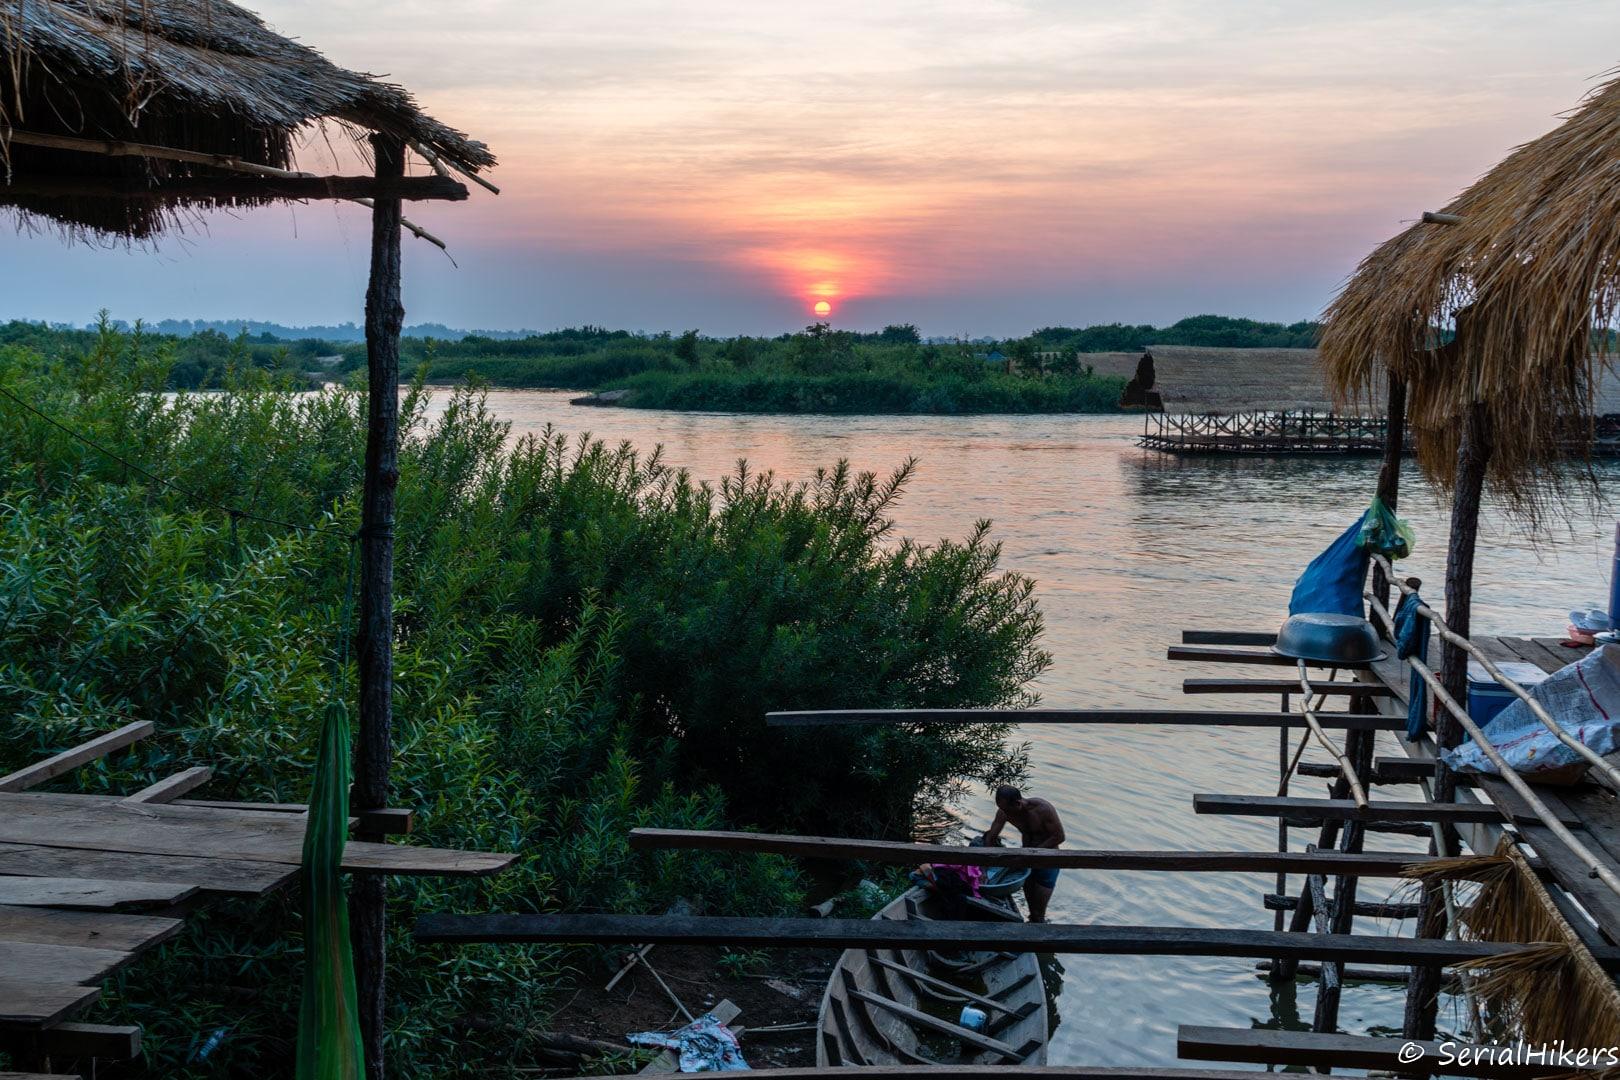 backpacking Jul&Gaux SerialHikers autostop hitchhiking aventure adventure alternative travel voyage cambodge cambodia dolphins mekong dauphins kratie